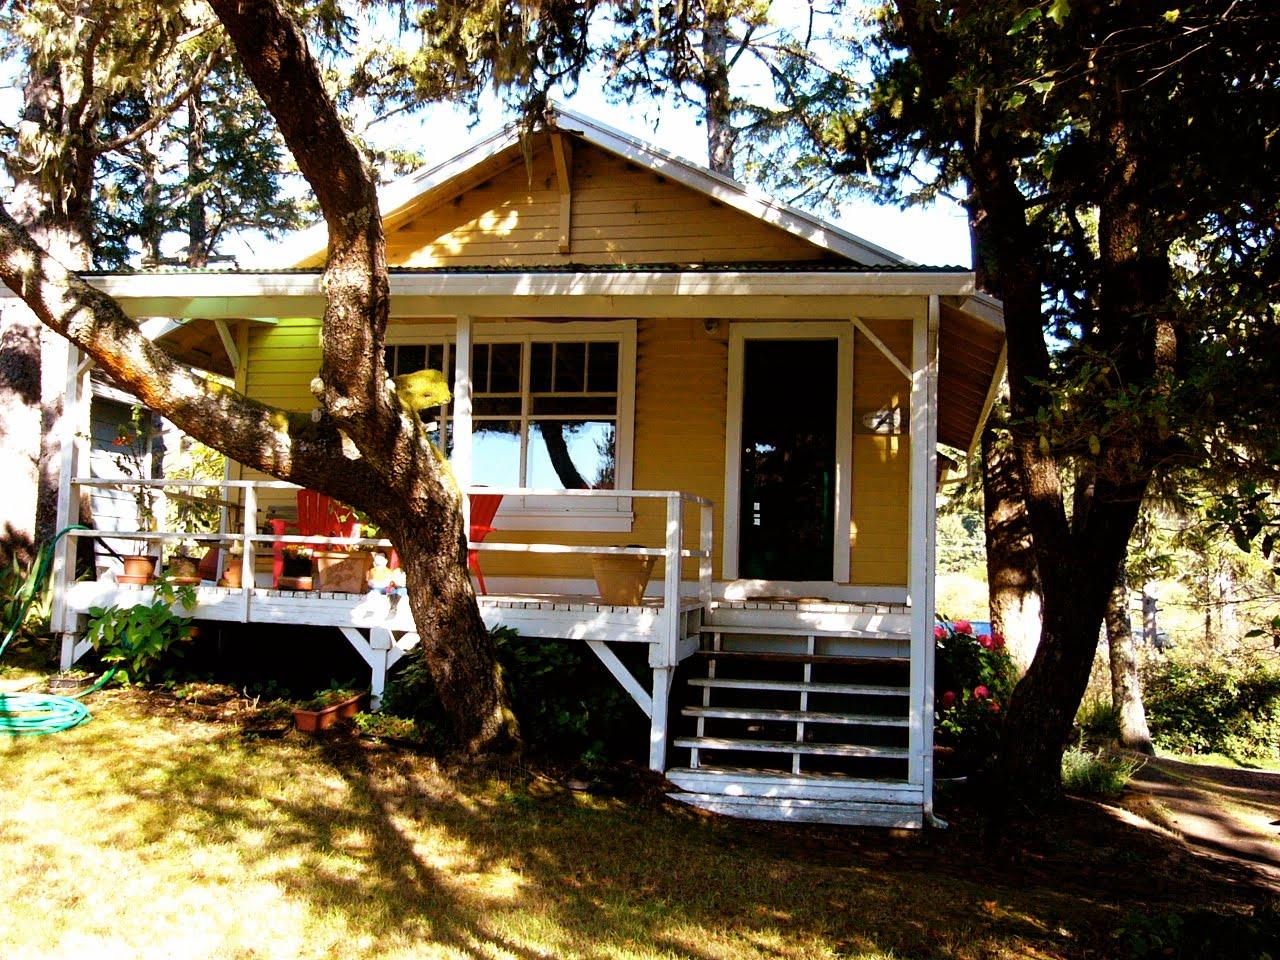 neskowin oregon beach house for sale historic oregon coast cottage rh oregoncoastbeachhouse blogspot com oregon coast beach cottages for sale oregon coast cottages for sale